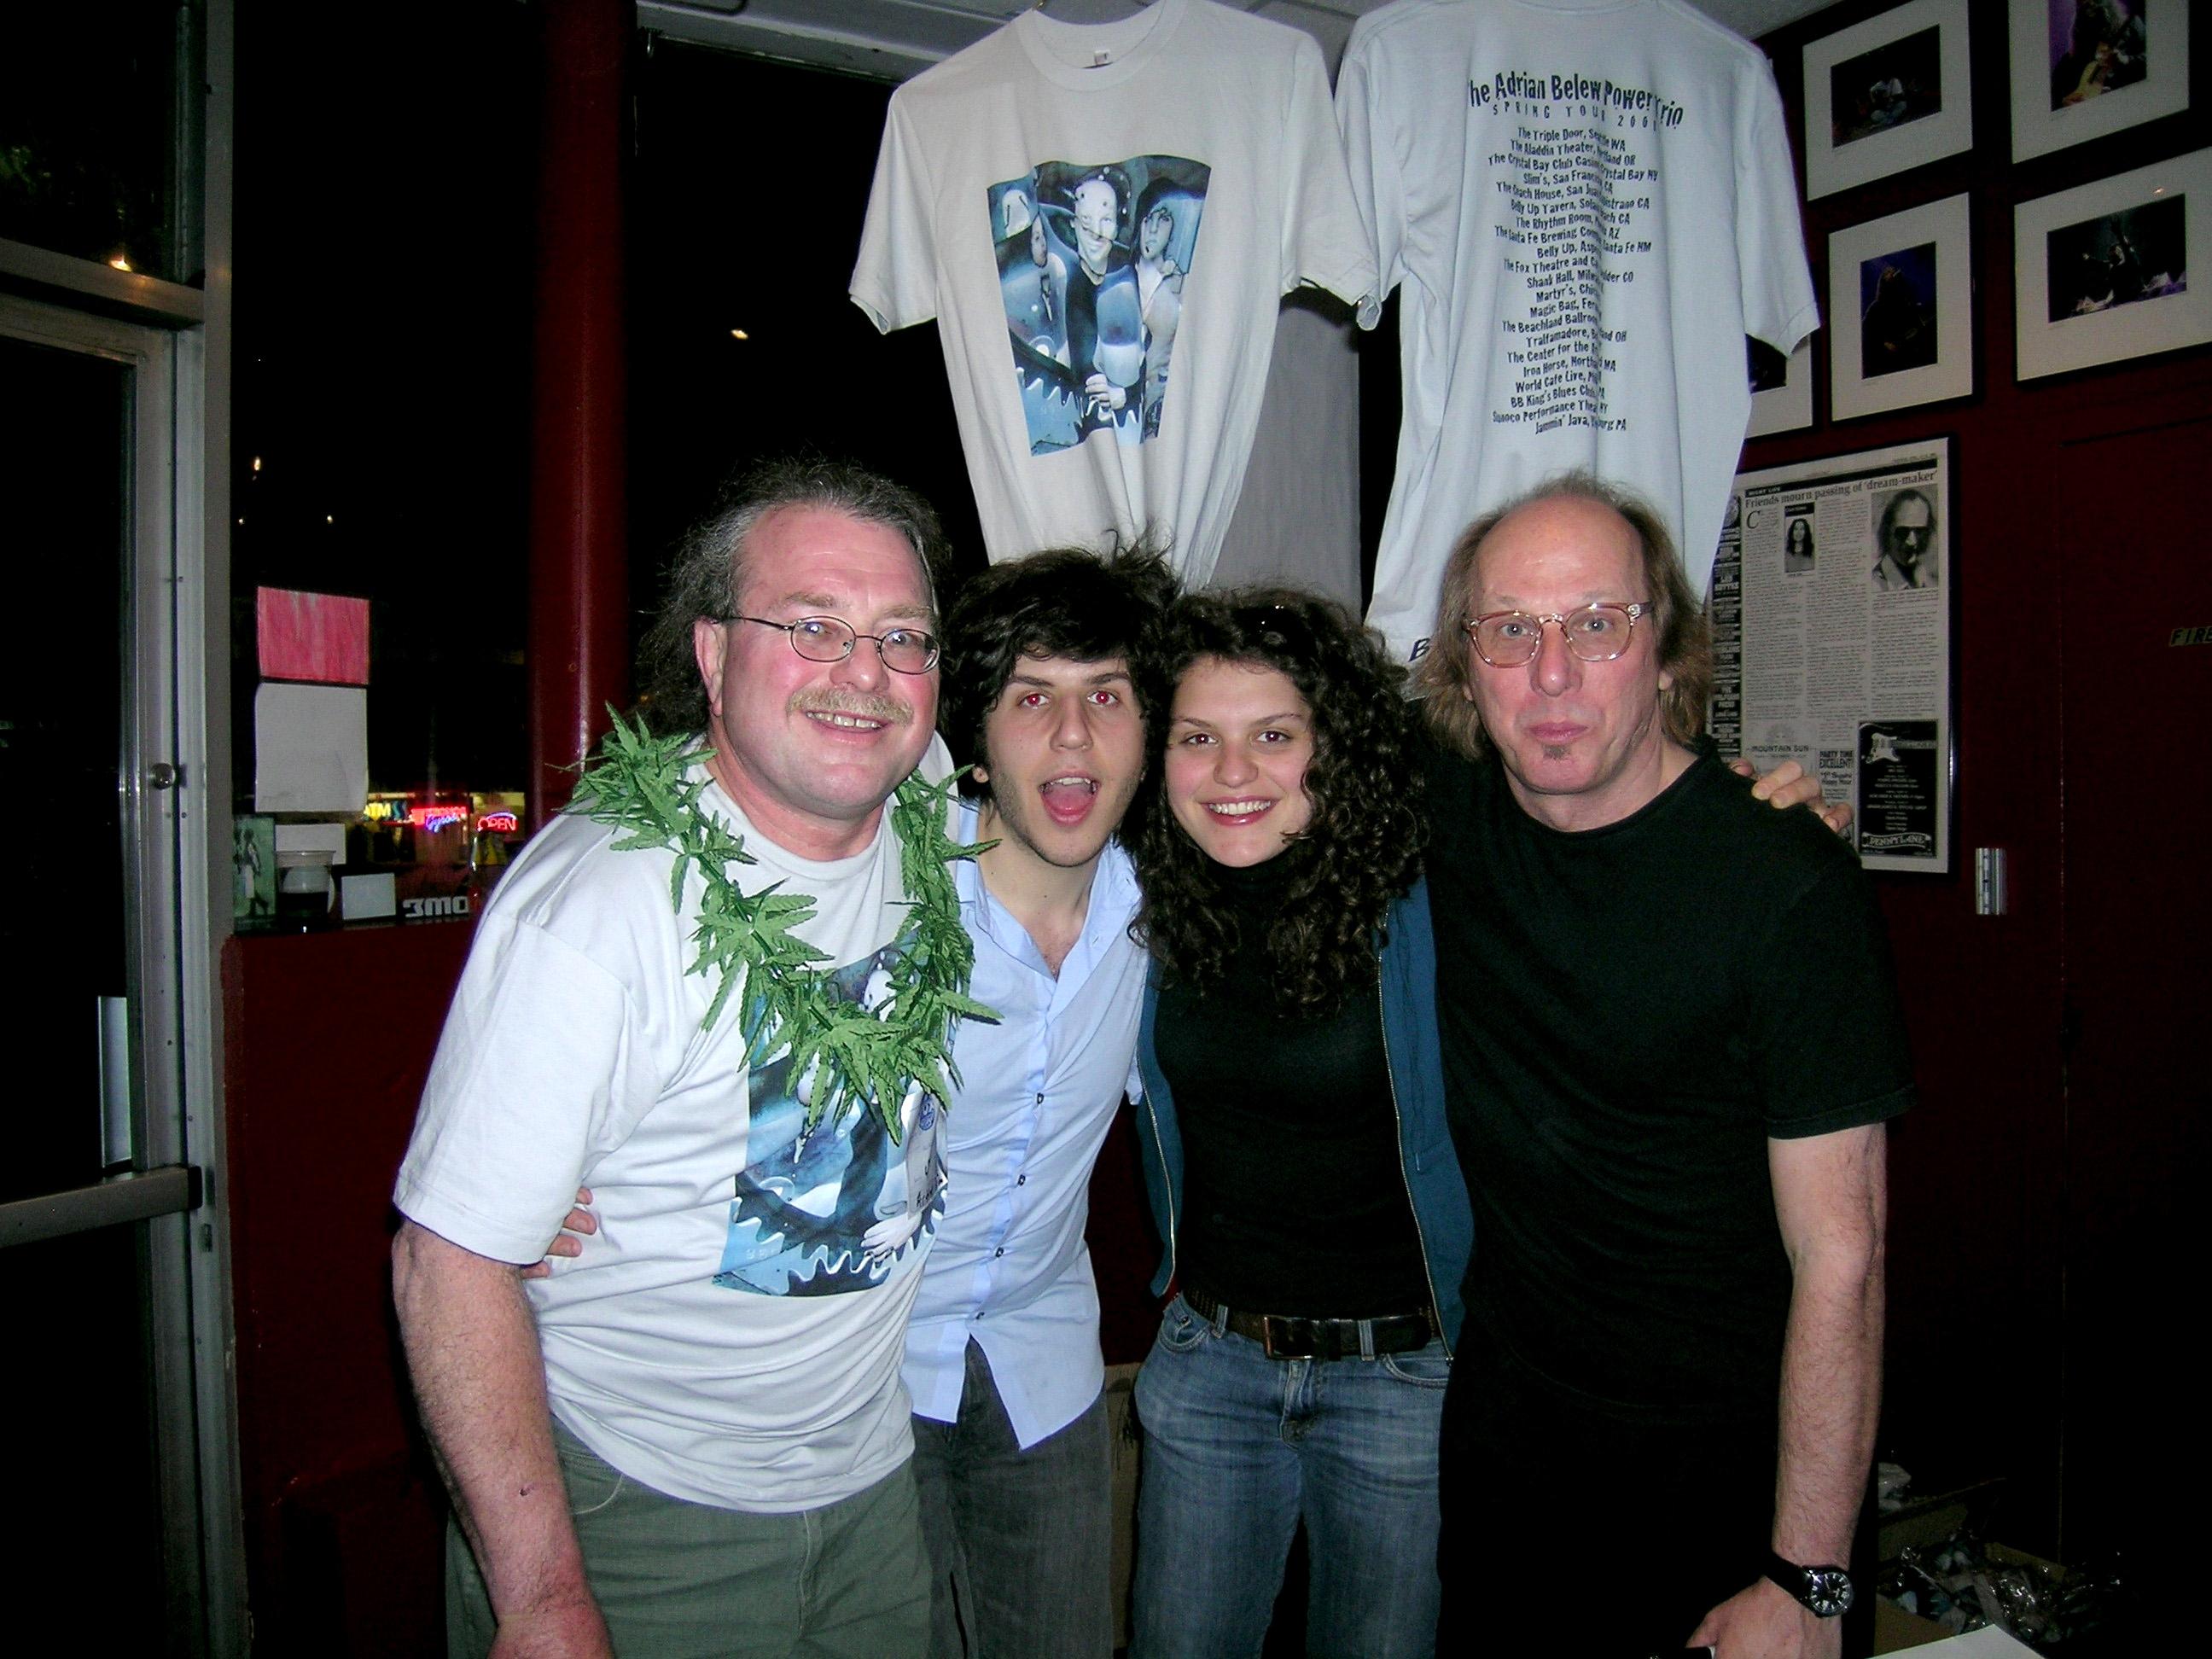 Adrian Belew, Julie Slick, Eric Slick and I